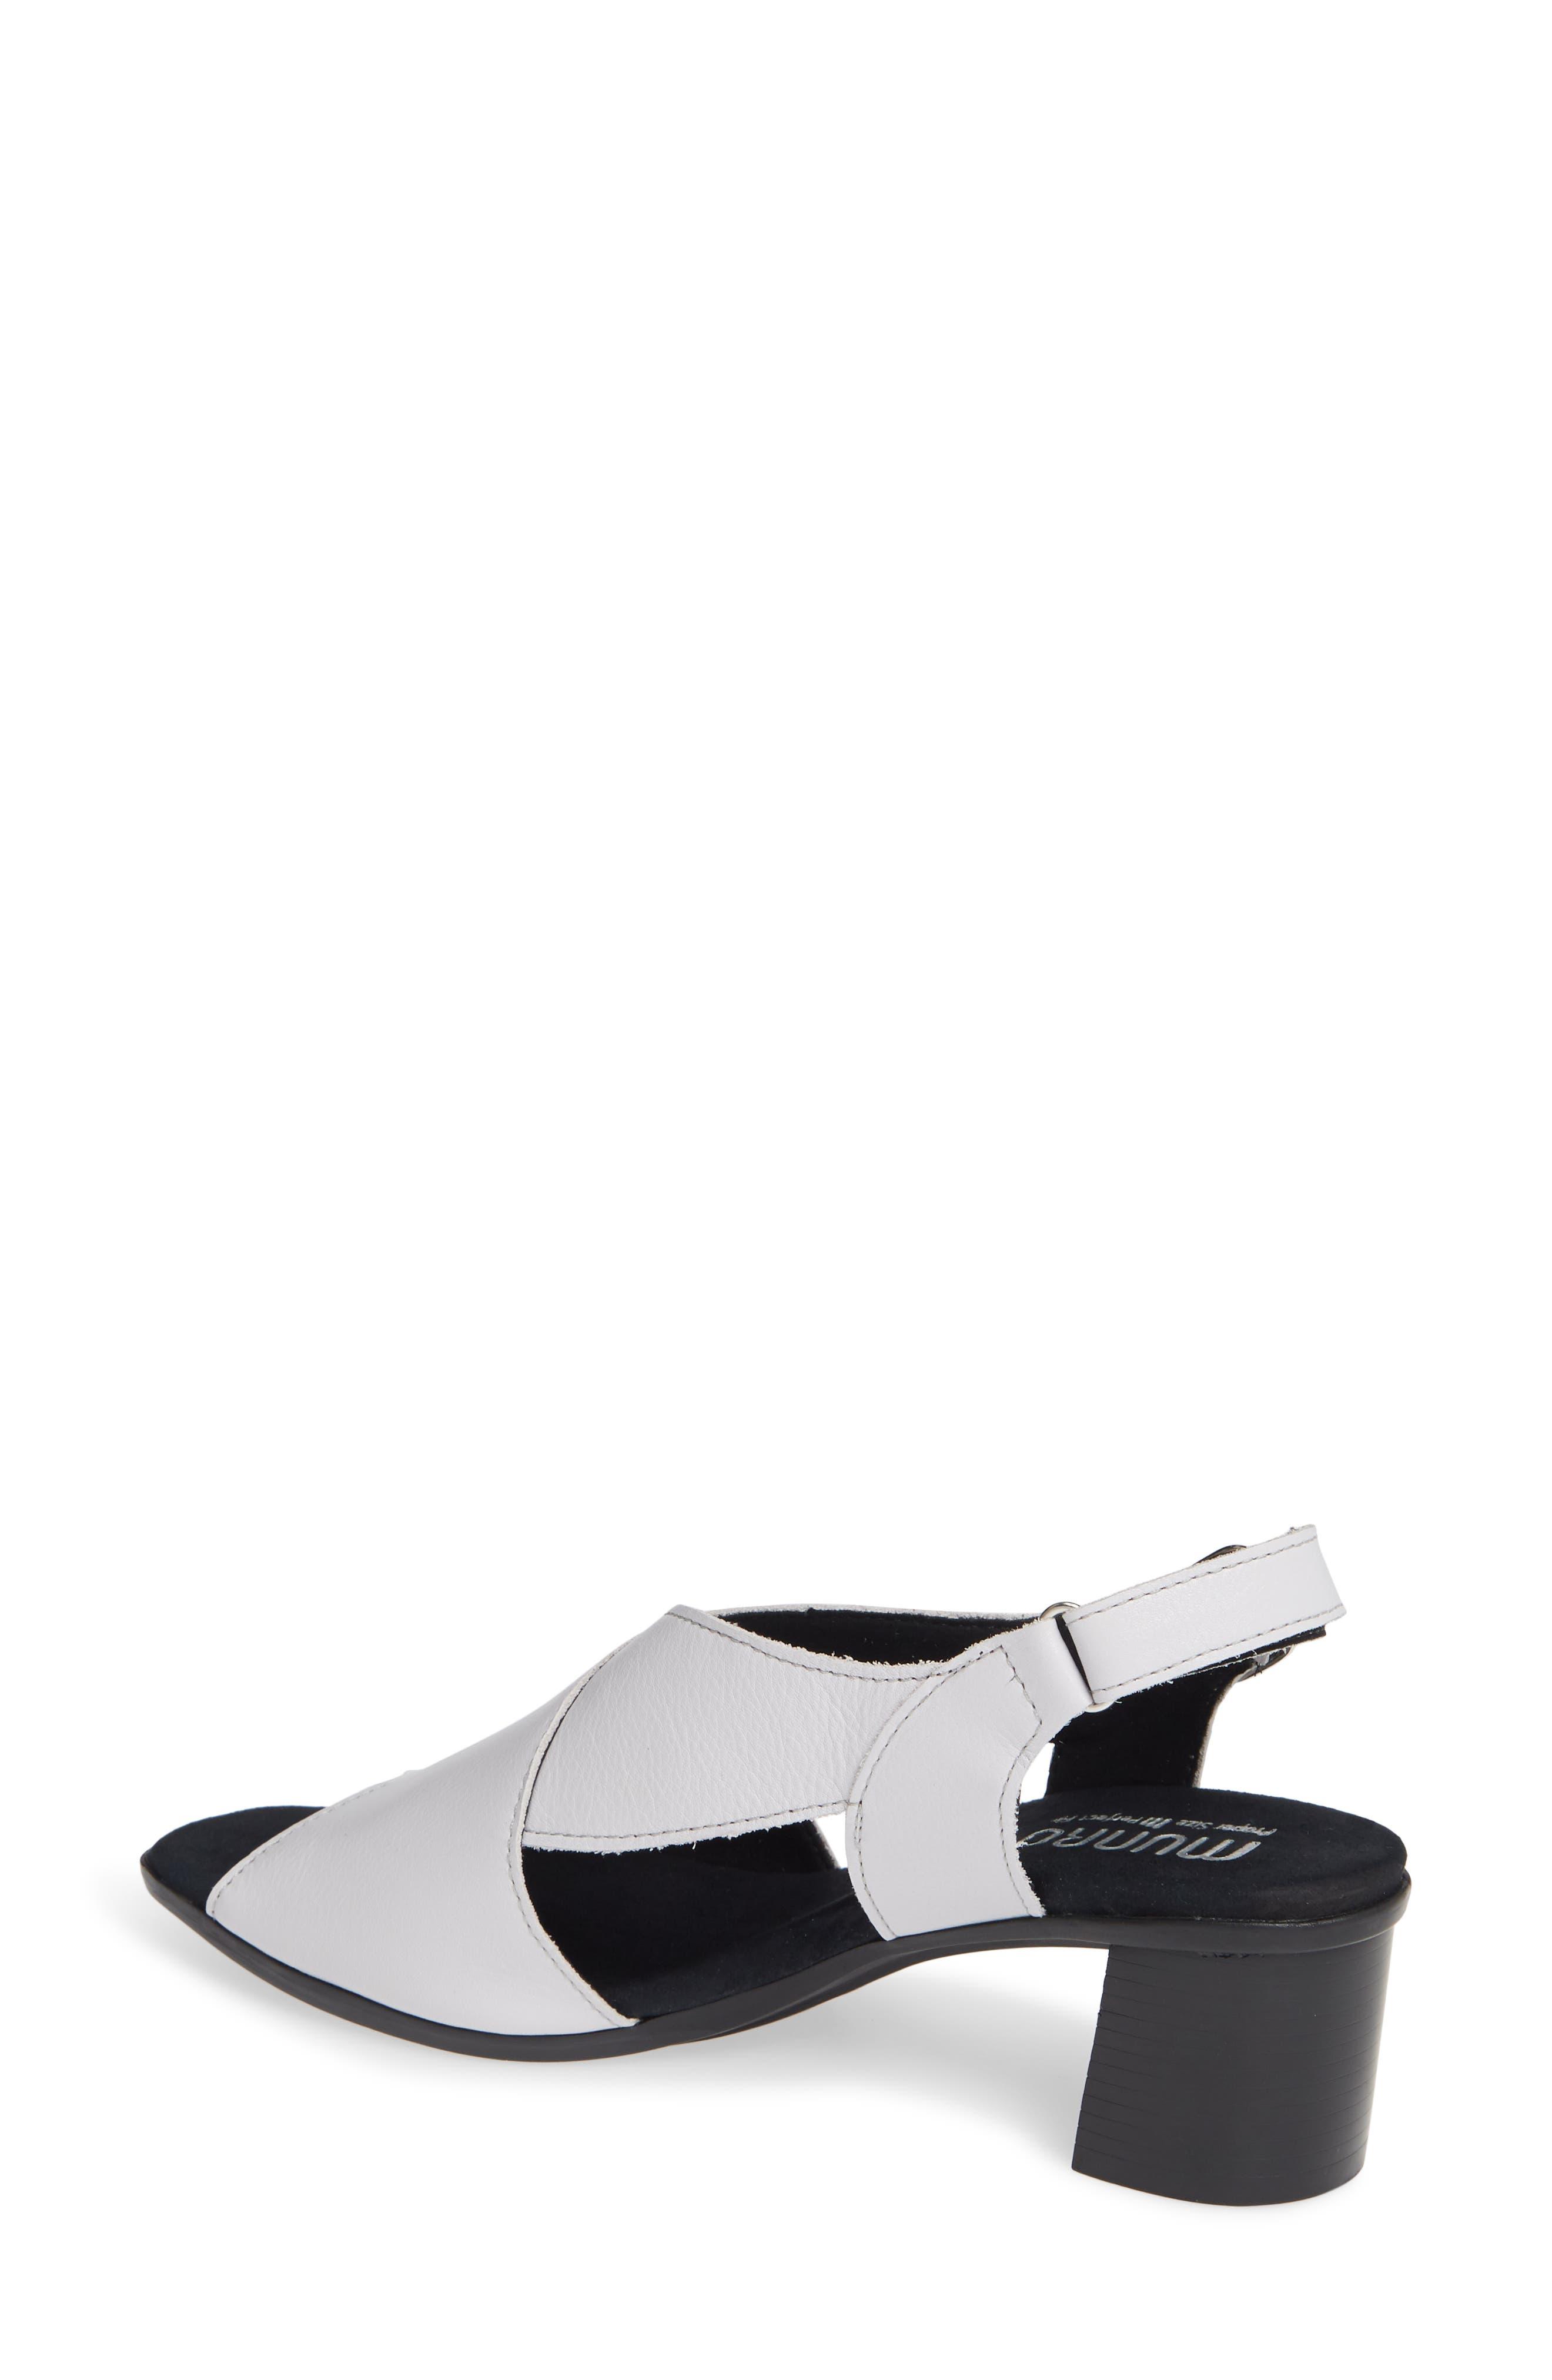 MUNRO, Laine Block Heel Sandal, Alternate thumbnail 2, color, WHITE LEATHER